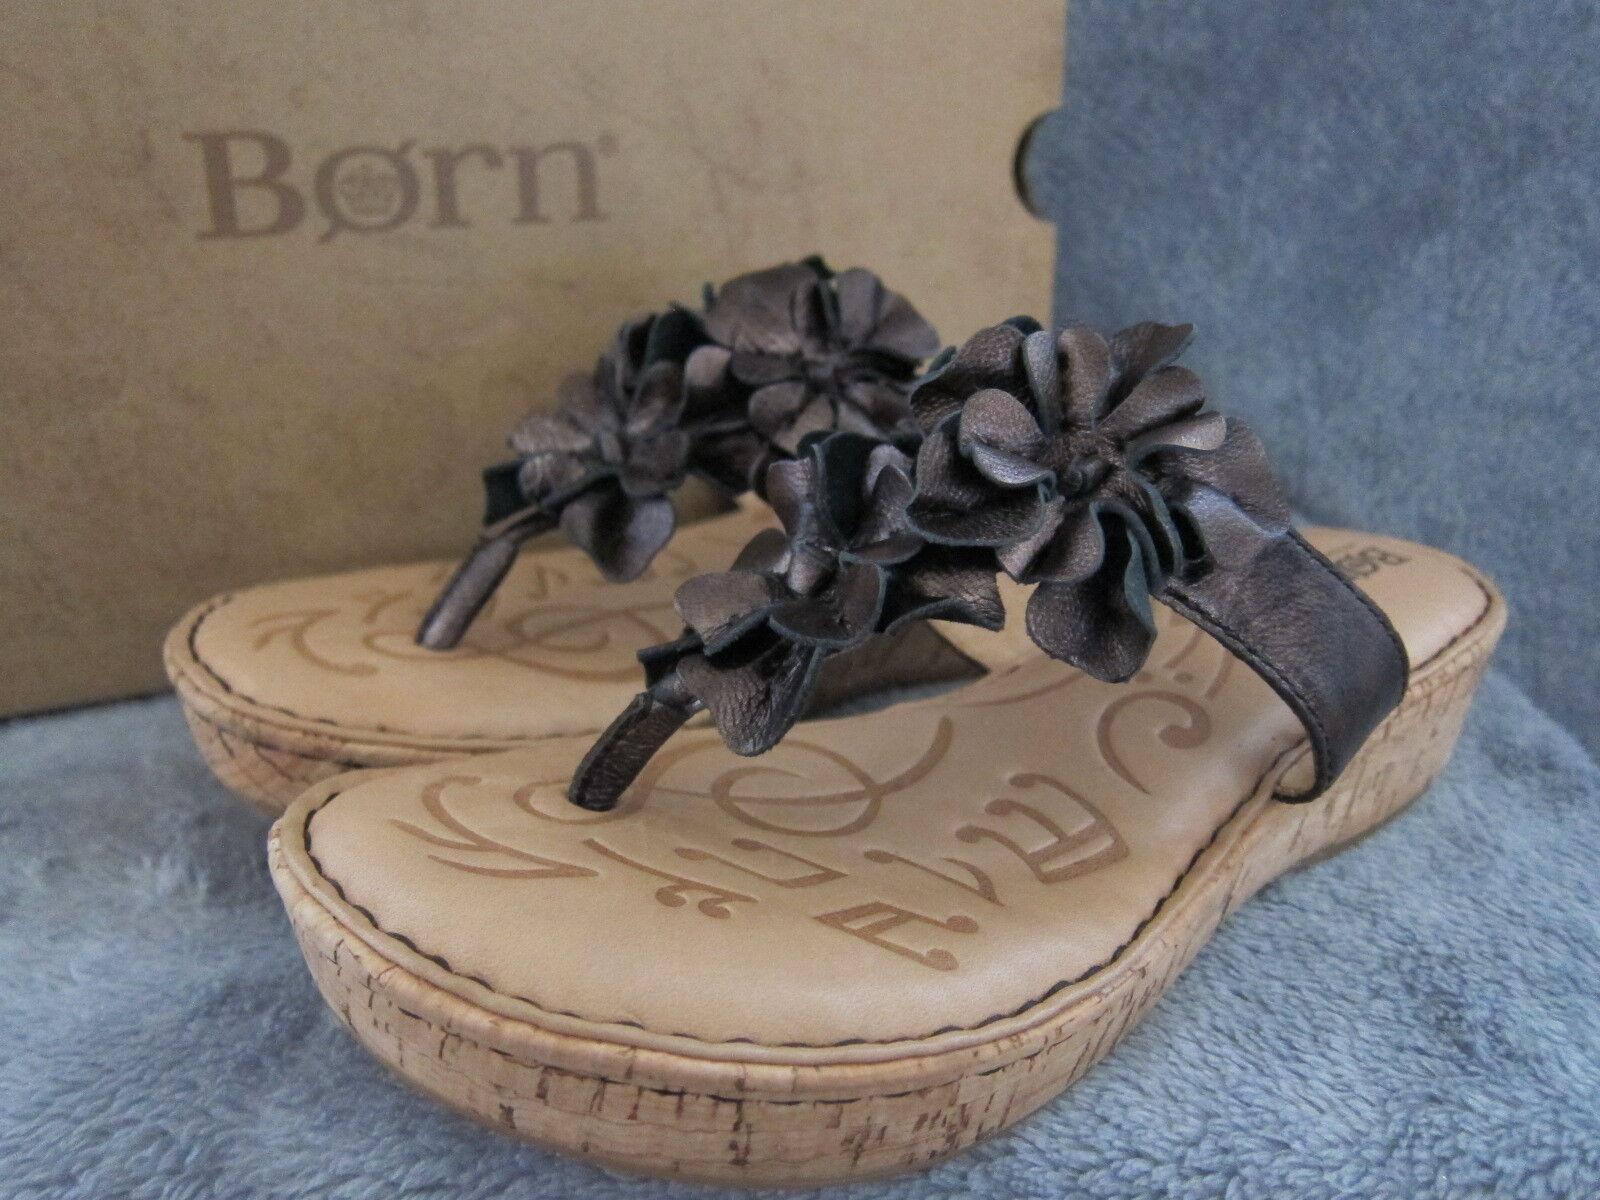 BORN BORN BORN B77023 Womens Kimona Dark Brown Leather Sandals shoes US 6 EUR 36.5 NWB a64c5d